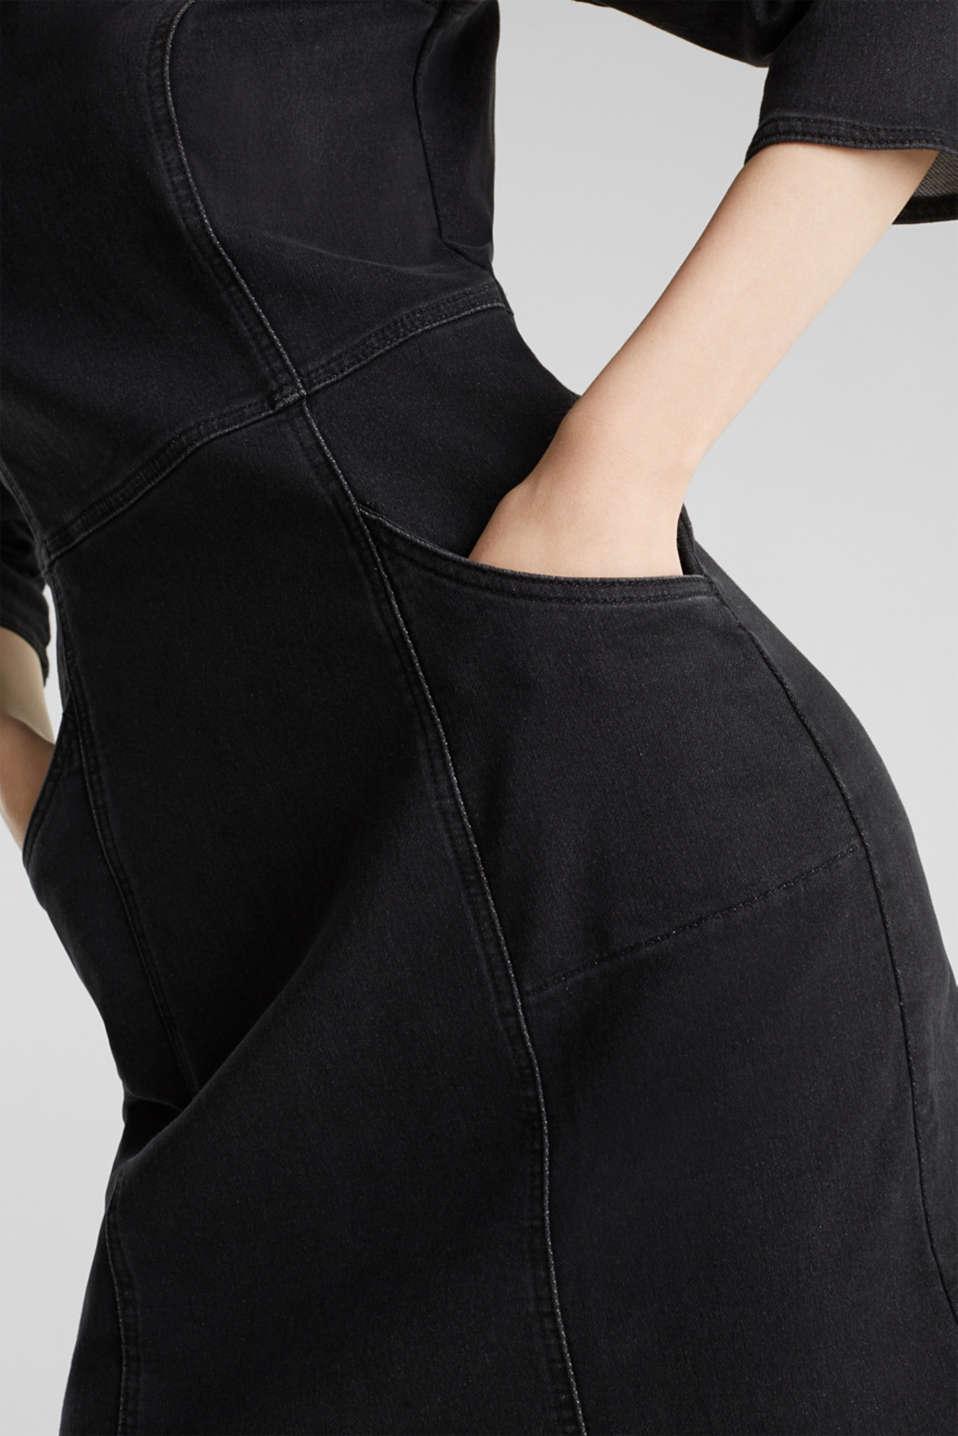 Stretch dress made of denim tracksuit fabric, BLACK DARK WASH, detail image number 3